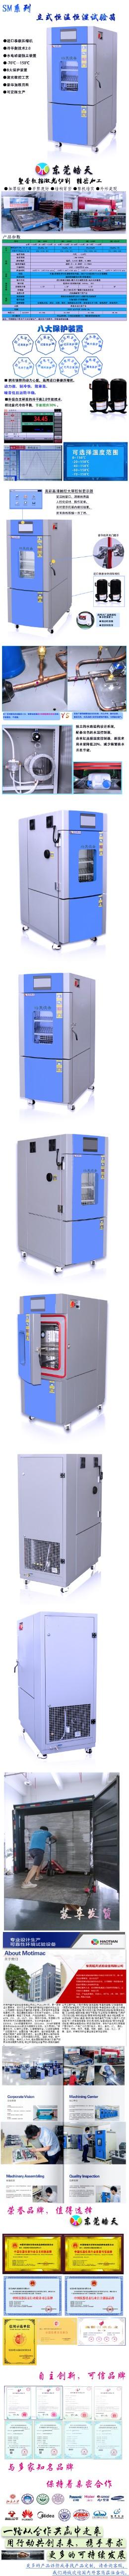 80L立式恒温恒湿试验箱061501 (1).jpg